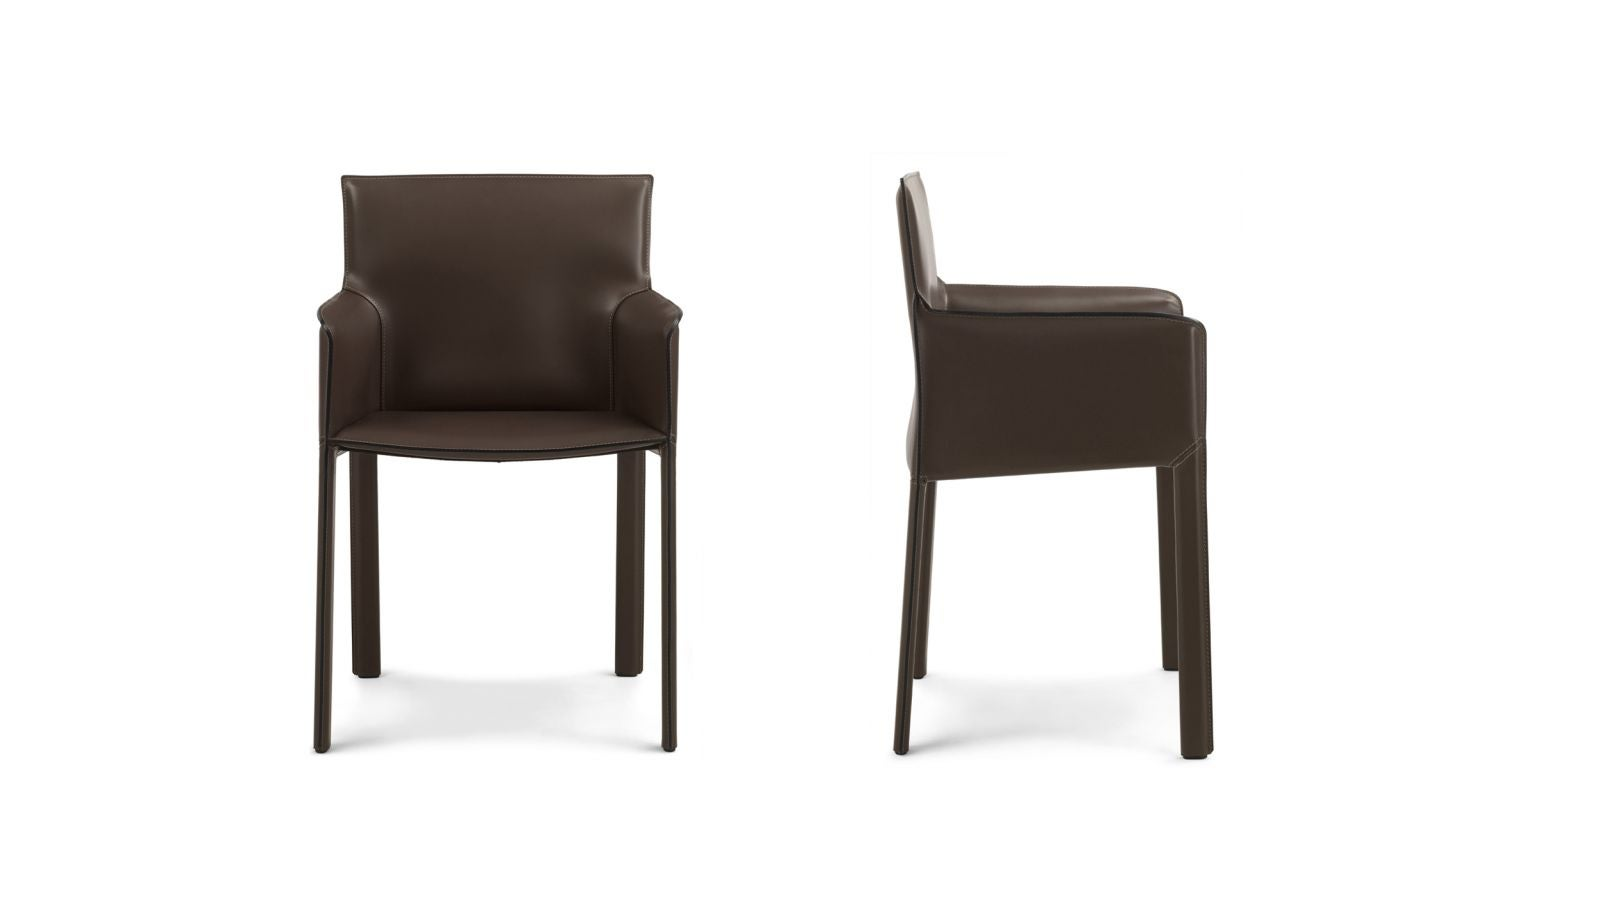 https://a.1stdibscdn.com/archivesE/upload/f_18083/1478638096638/modern_office_armchairs_Italian_furniture_designer_armchairs_26__org.jpg